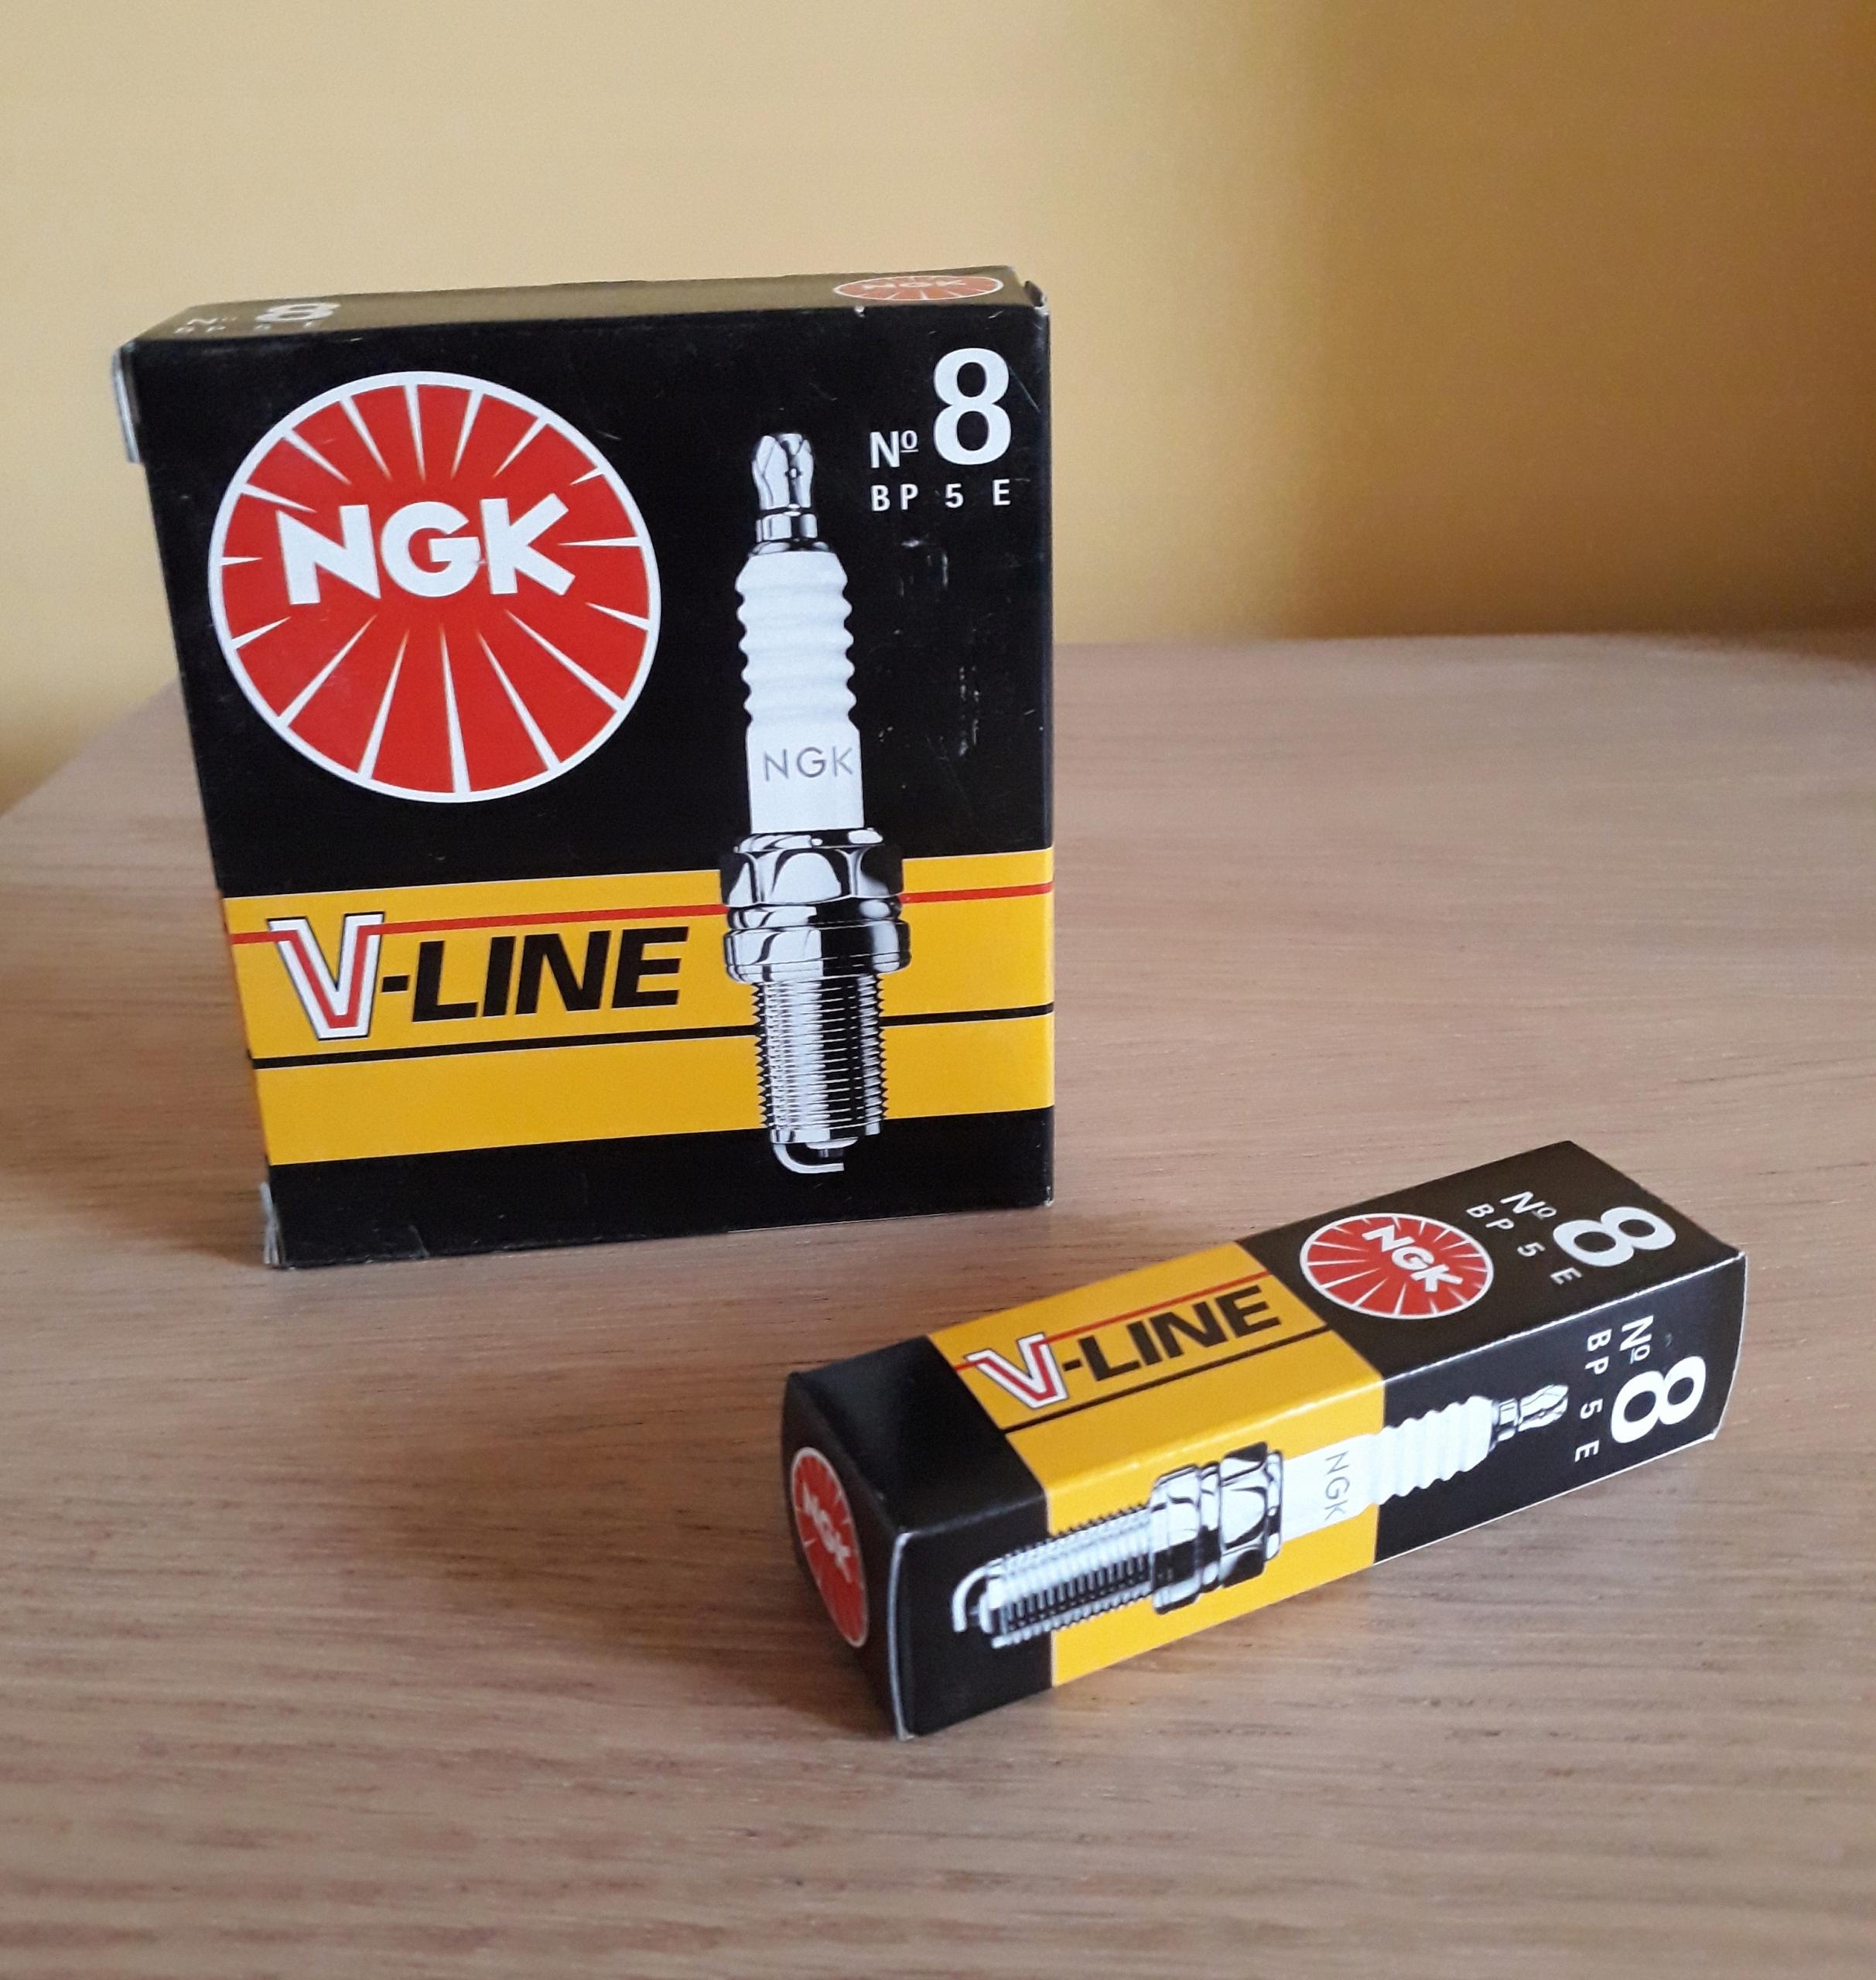 Свеча зажигания NGK V-LINE 8 BP5E